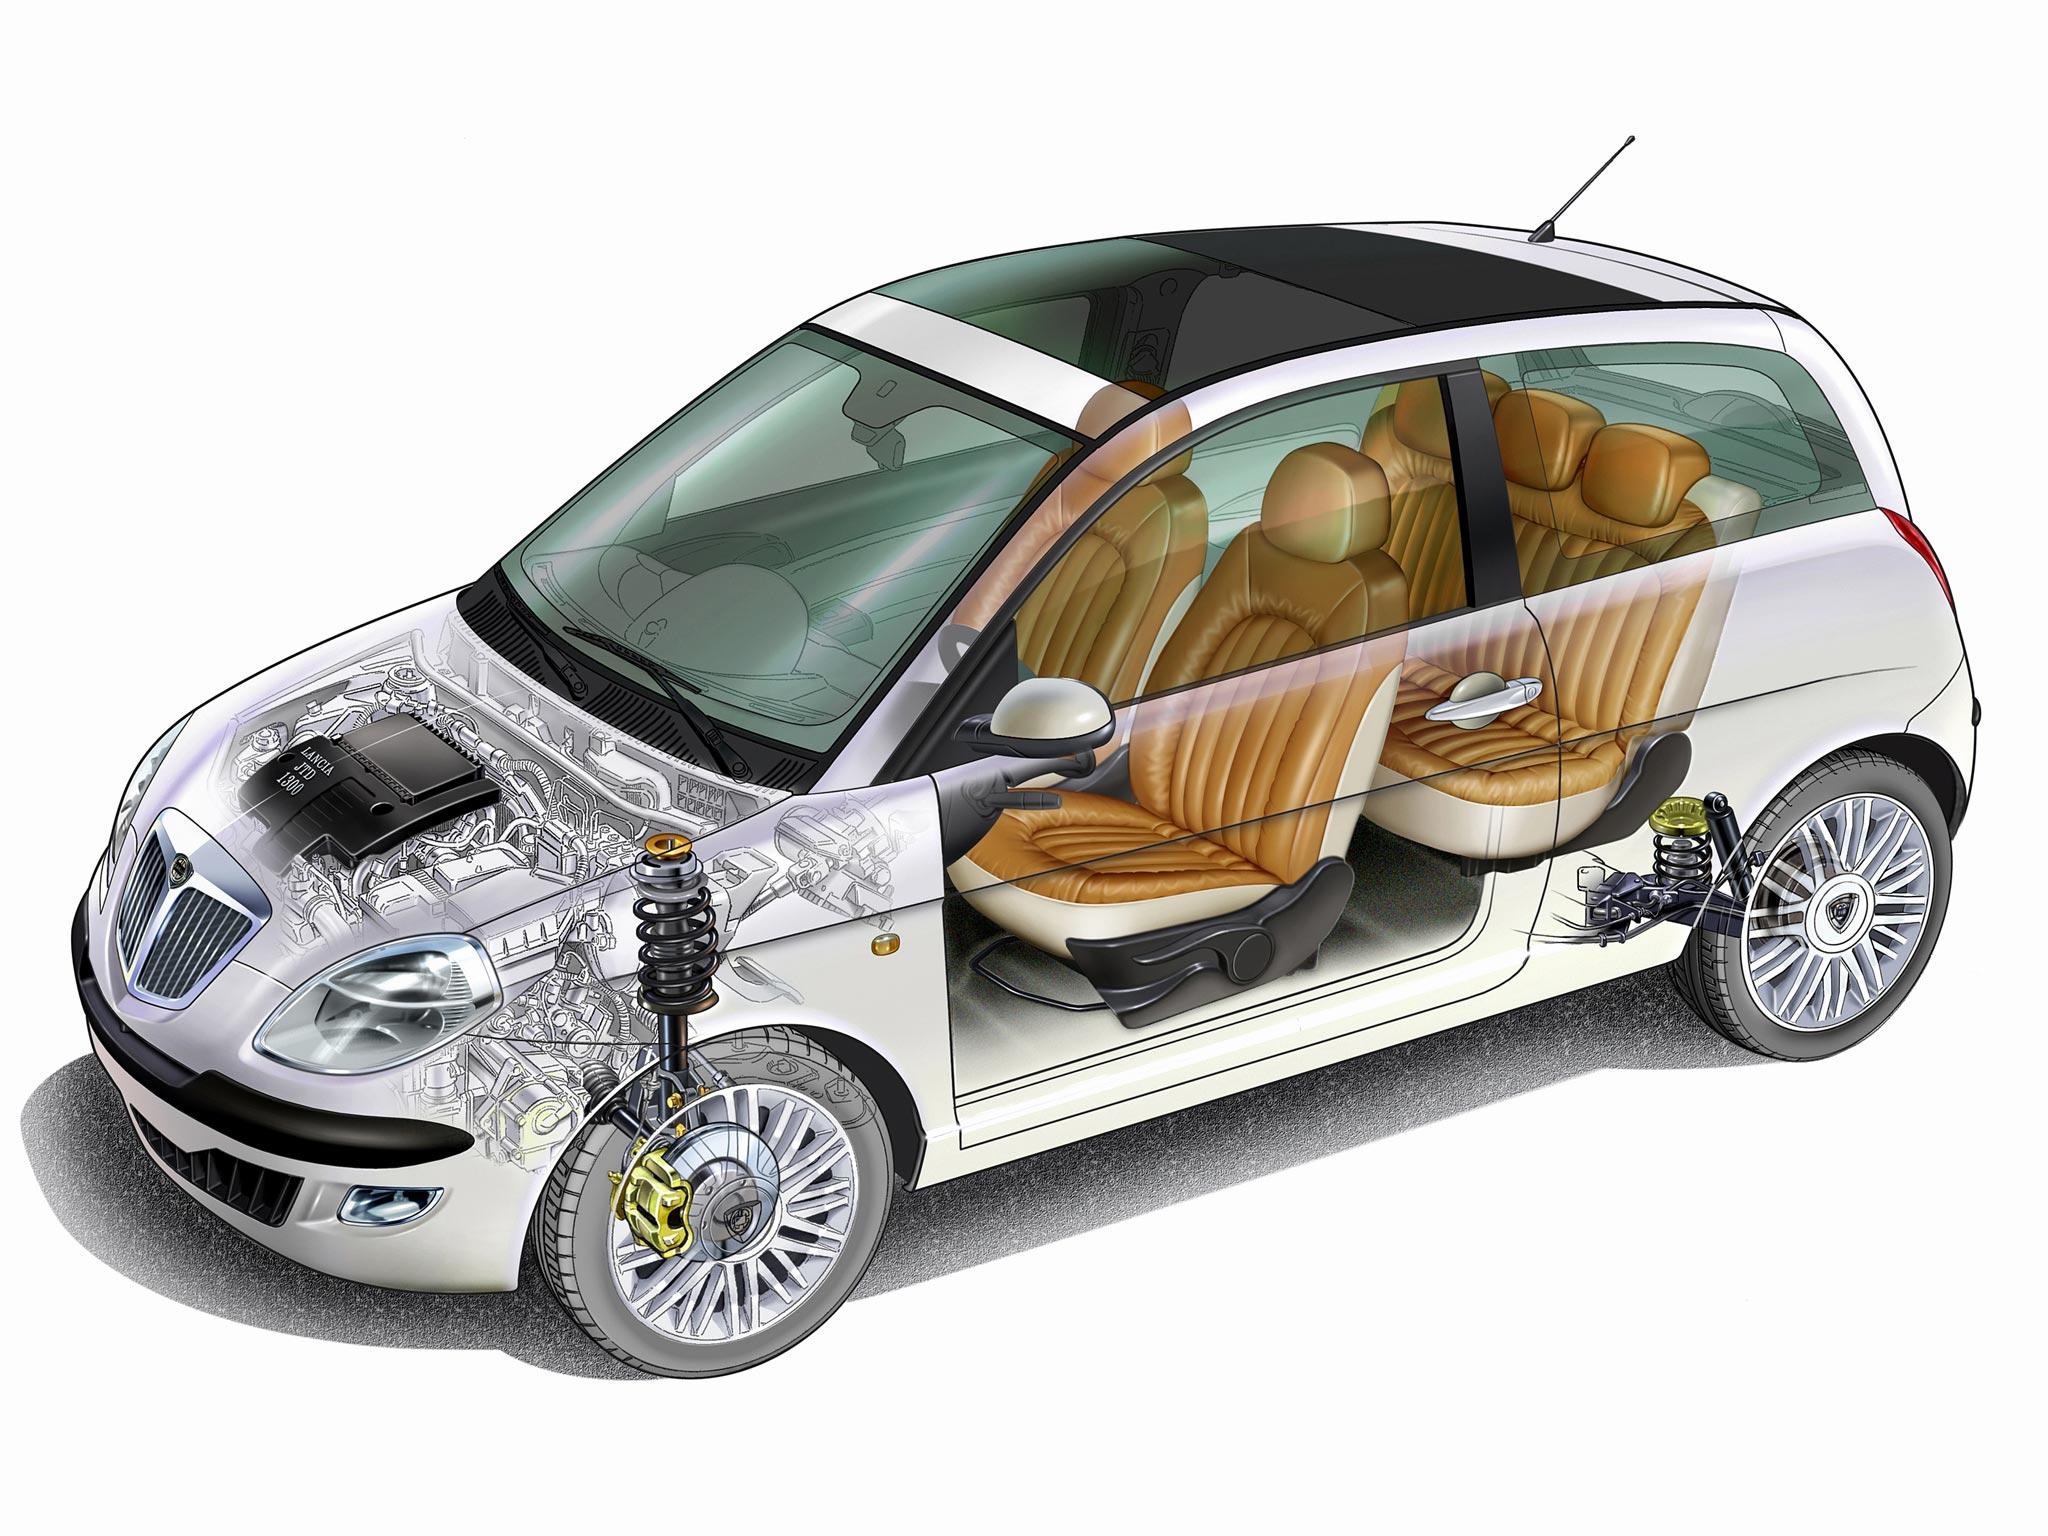 Lancia Ypsilon cutaway